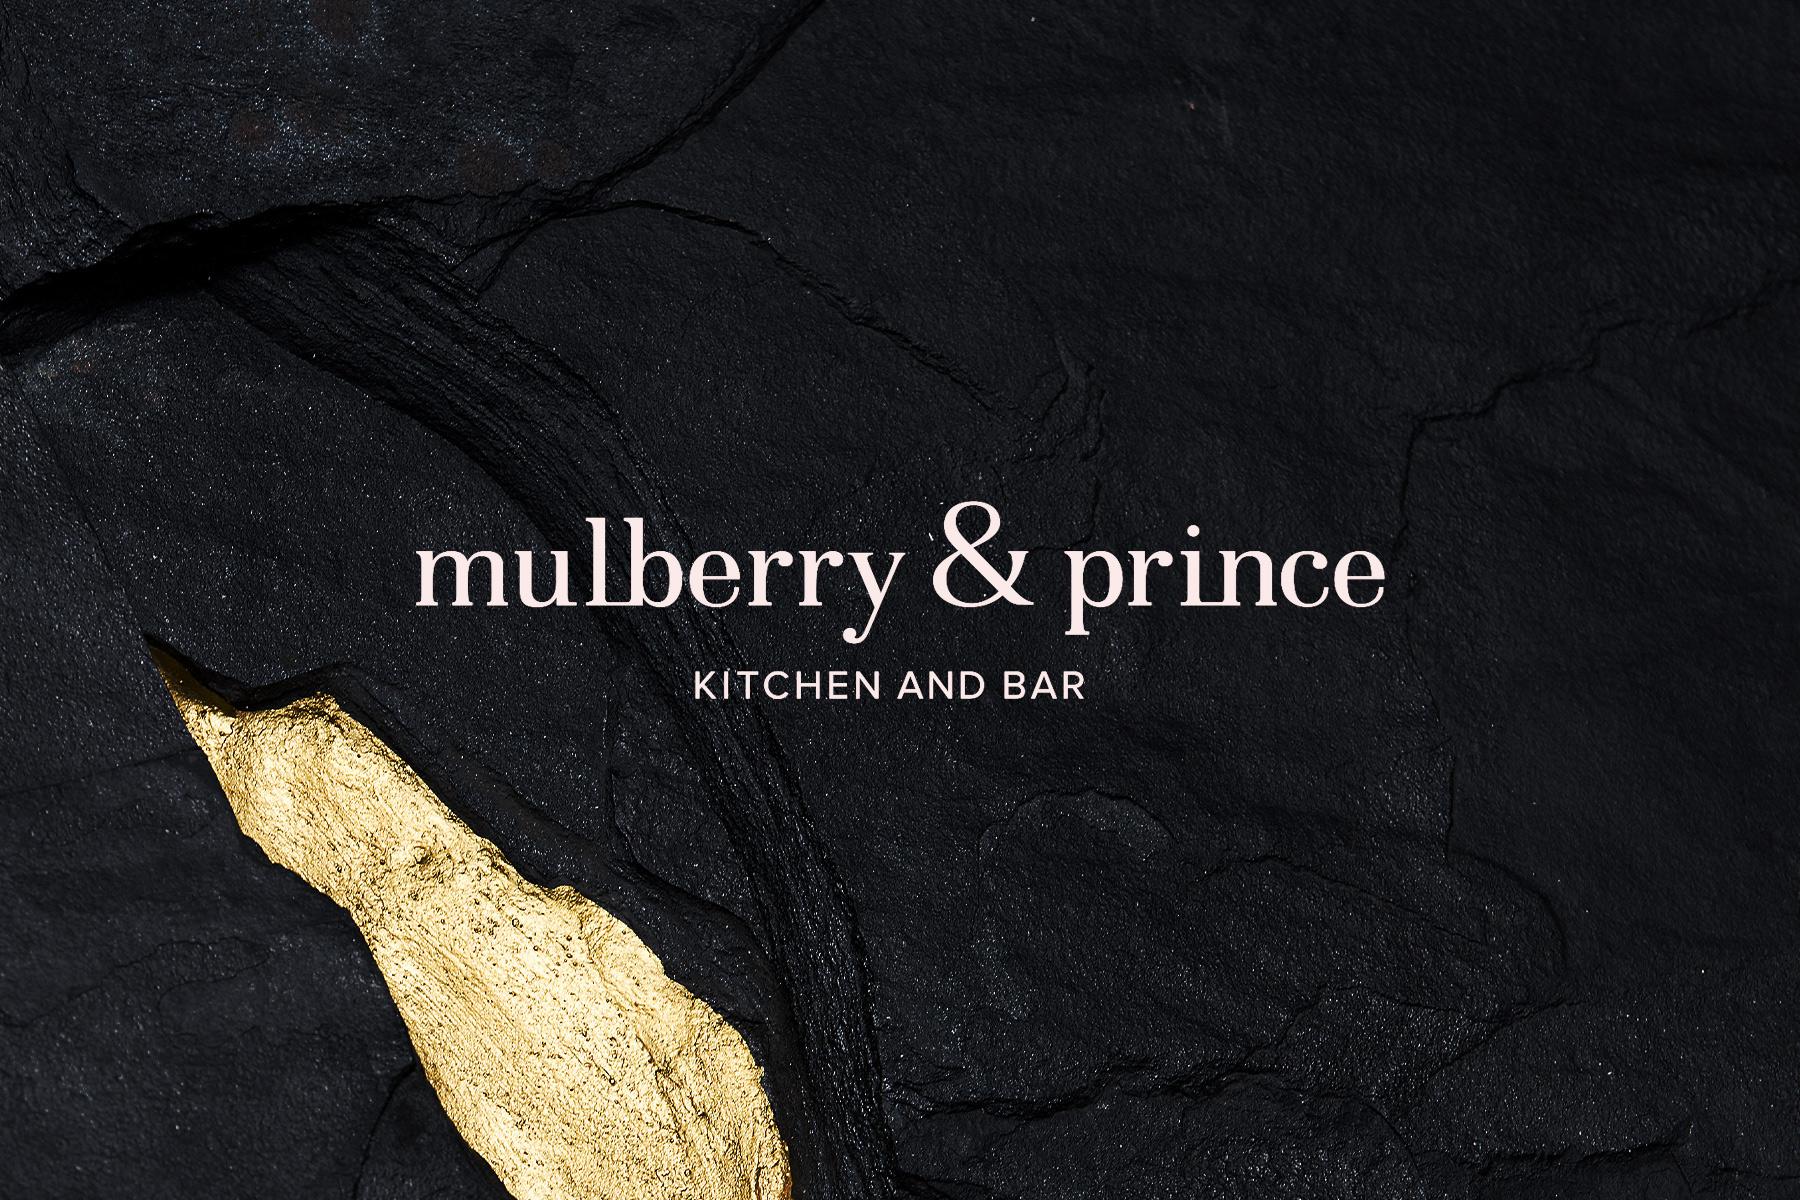 Mulberry & Prince restaurant and bar branding and design by Kim Van Vuuren & Atelier interior design studio in South Africa